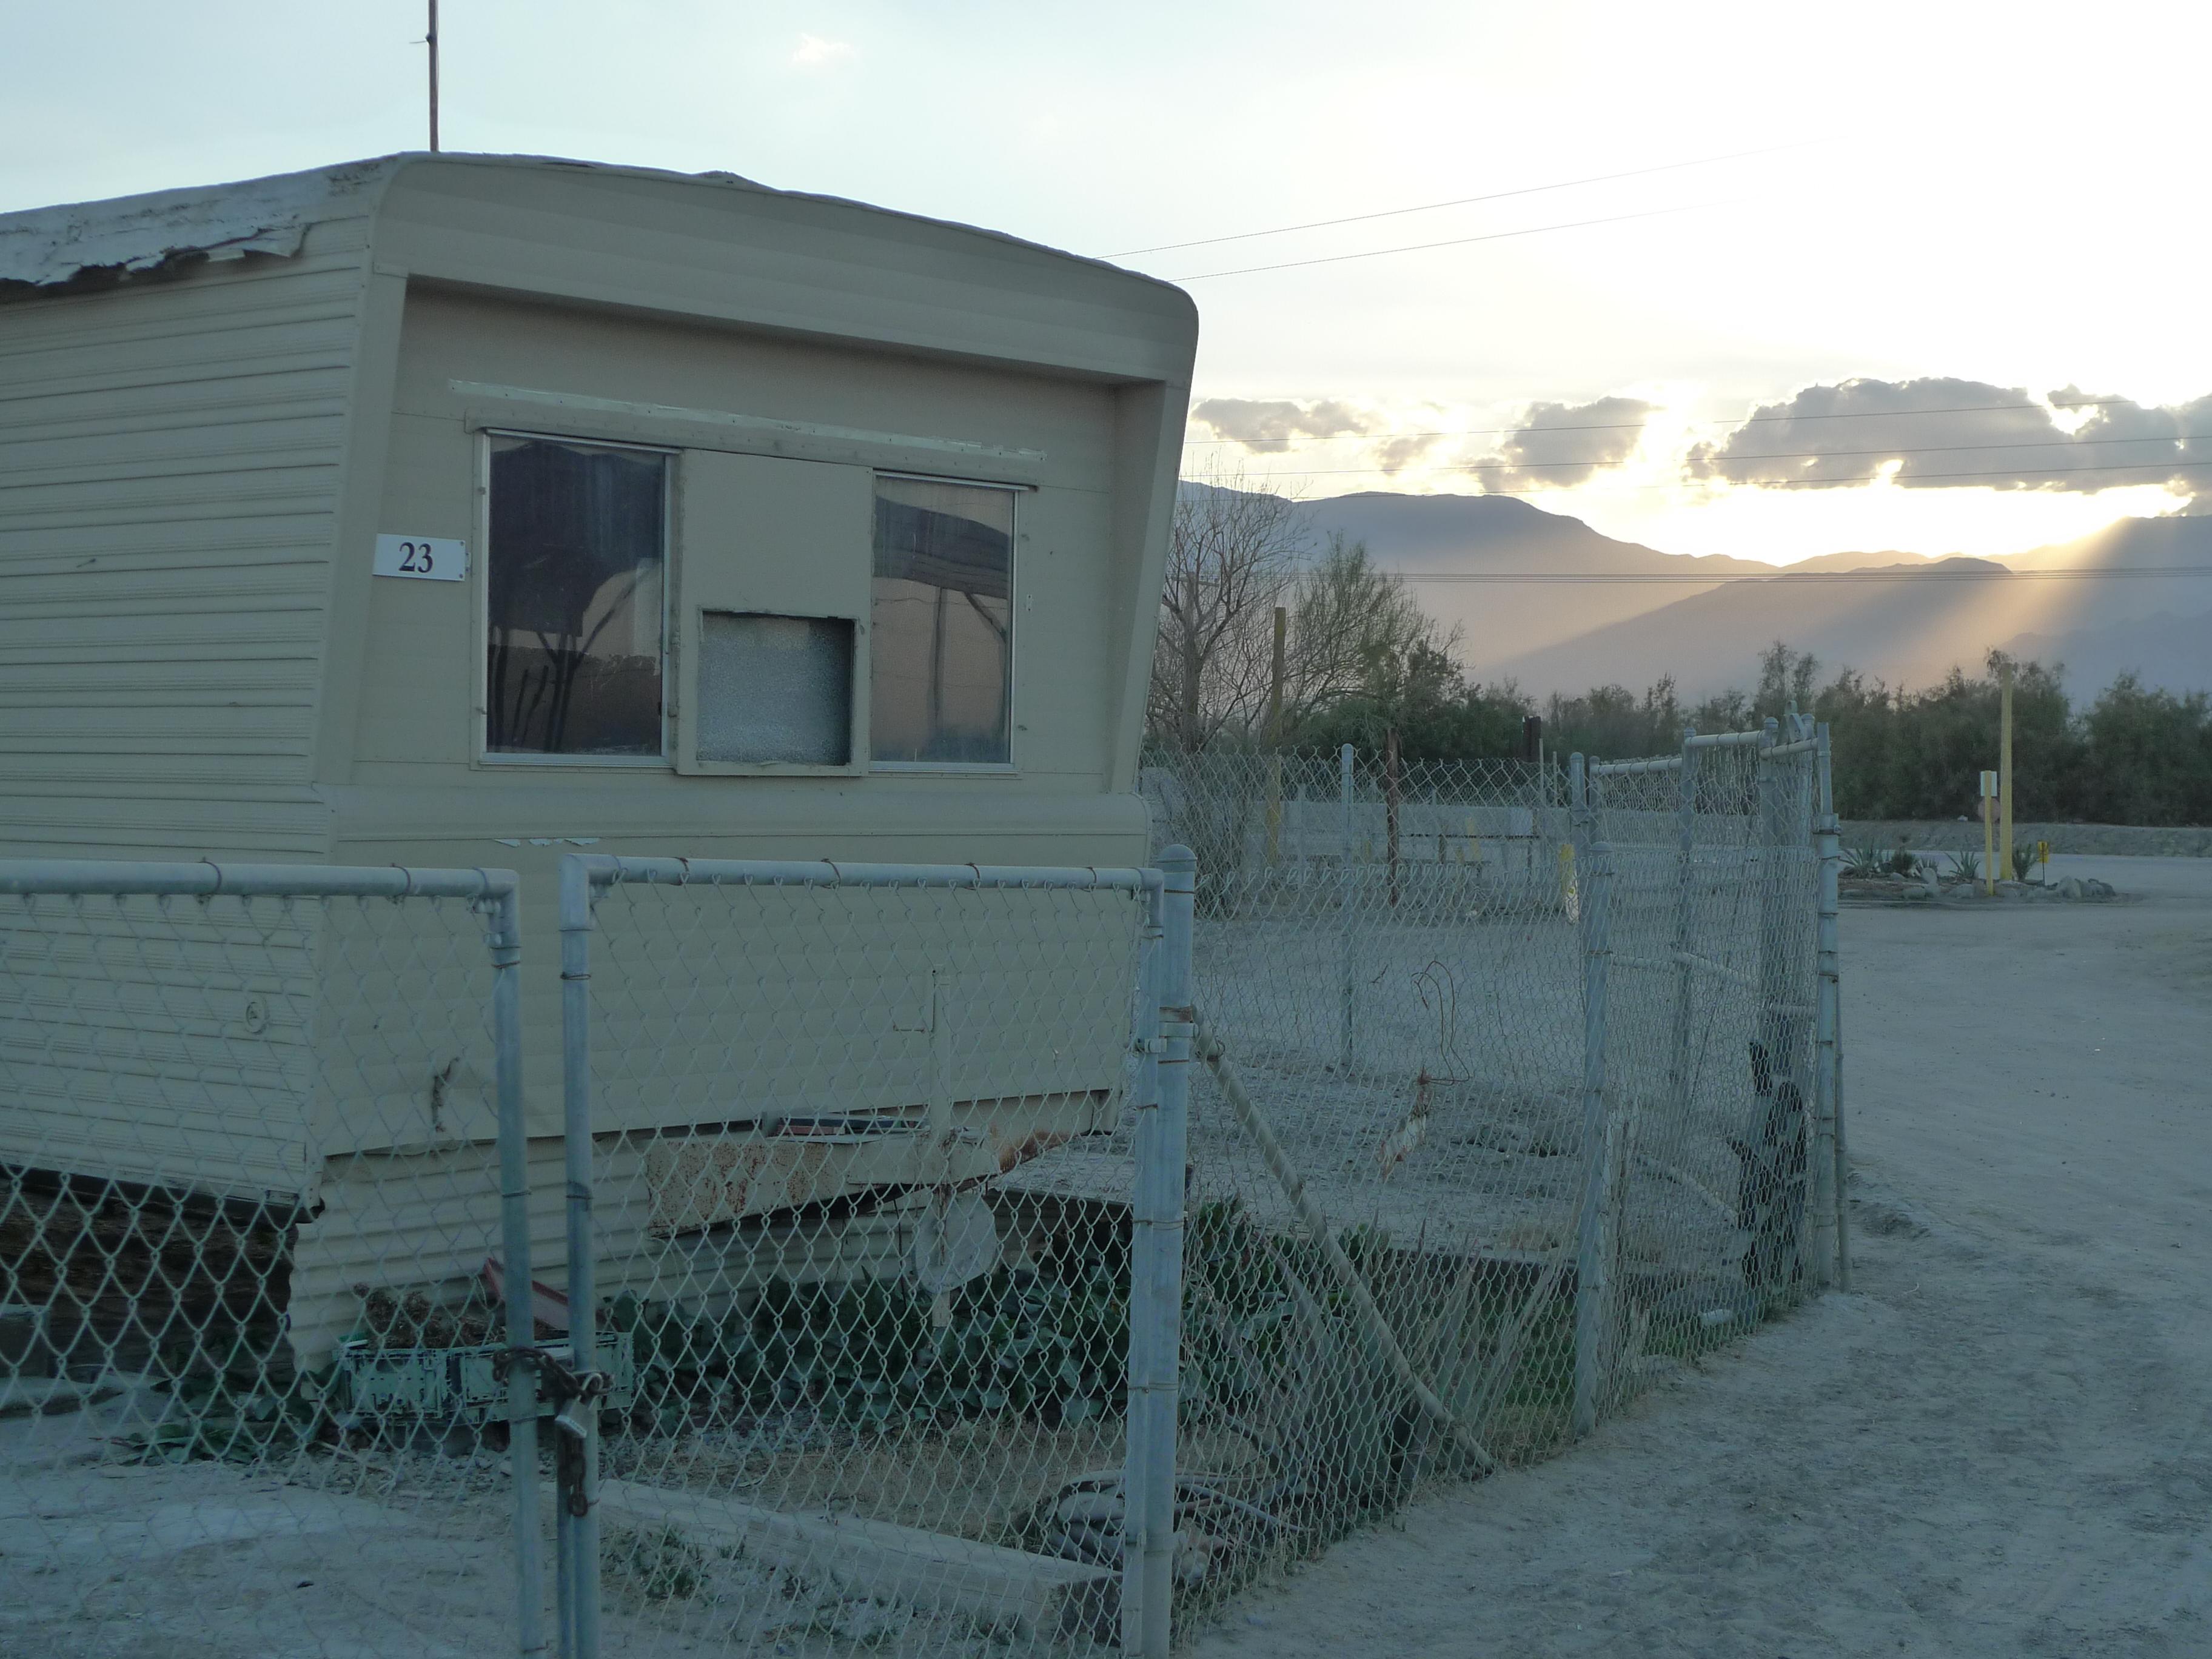 Caption: Mobile home park in Eastern Coachella., Credit: Lisa Morehouse